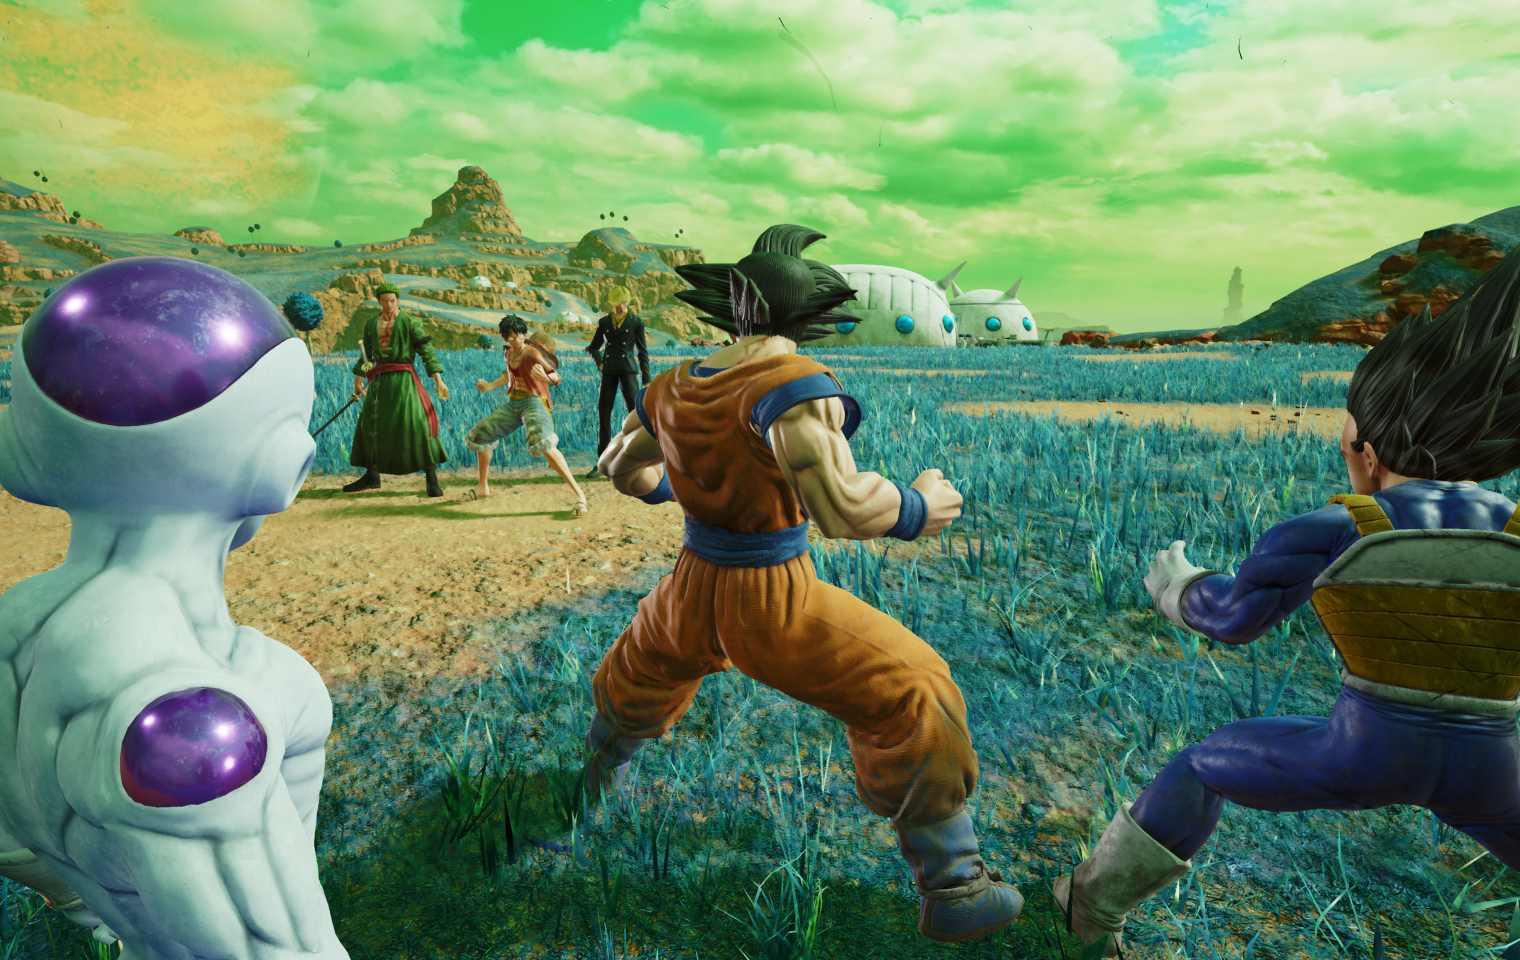 Jump Force: Der Anime-Allstar-Prügler im Test